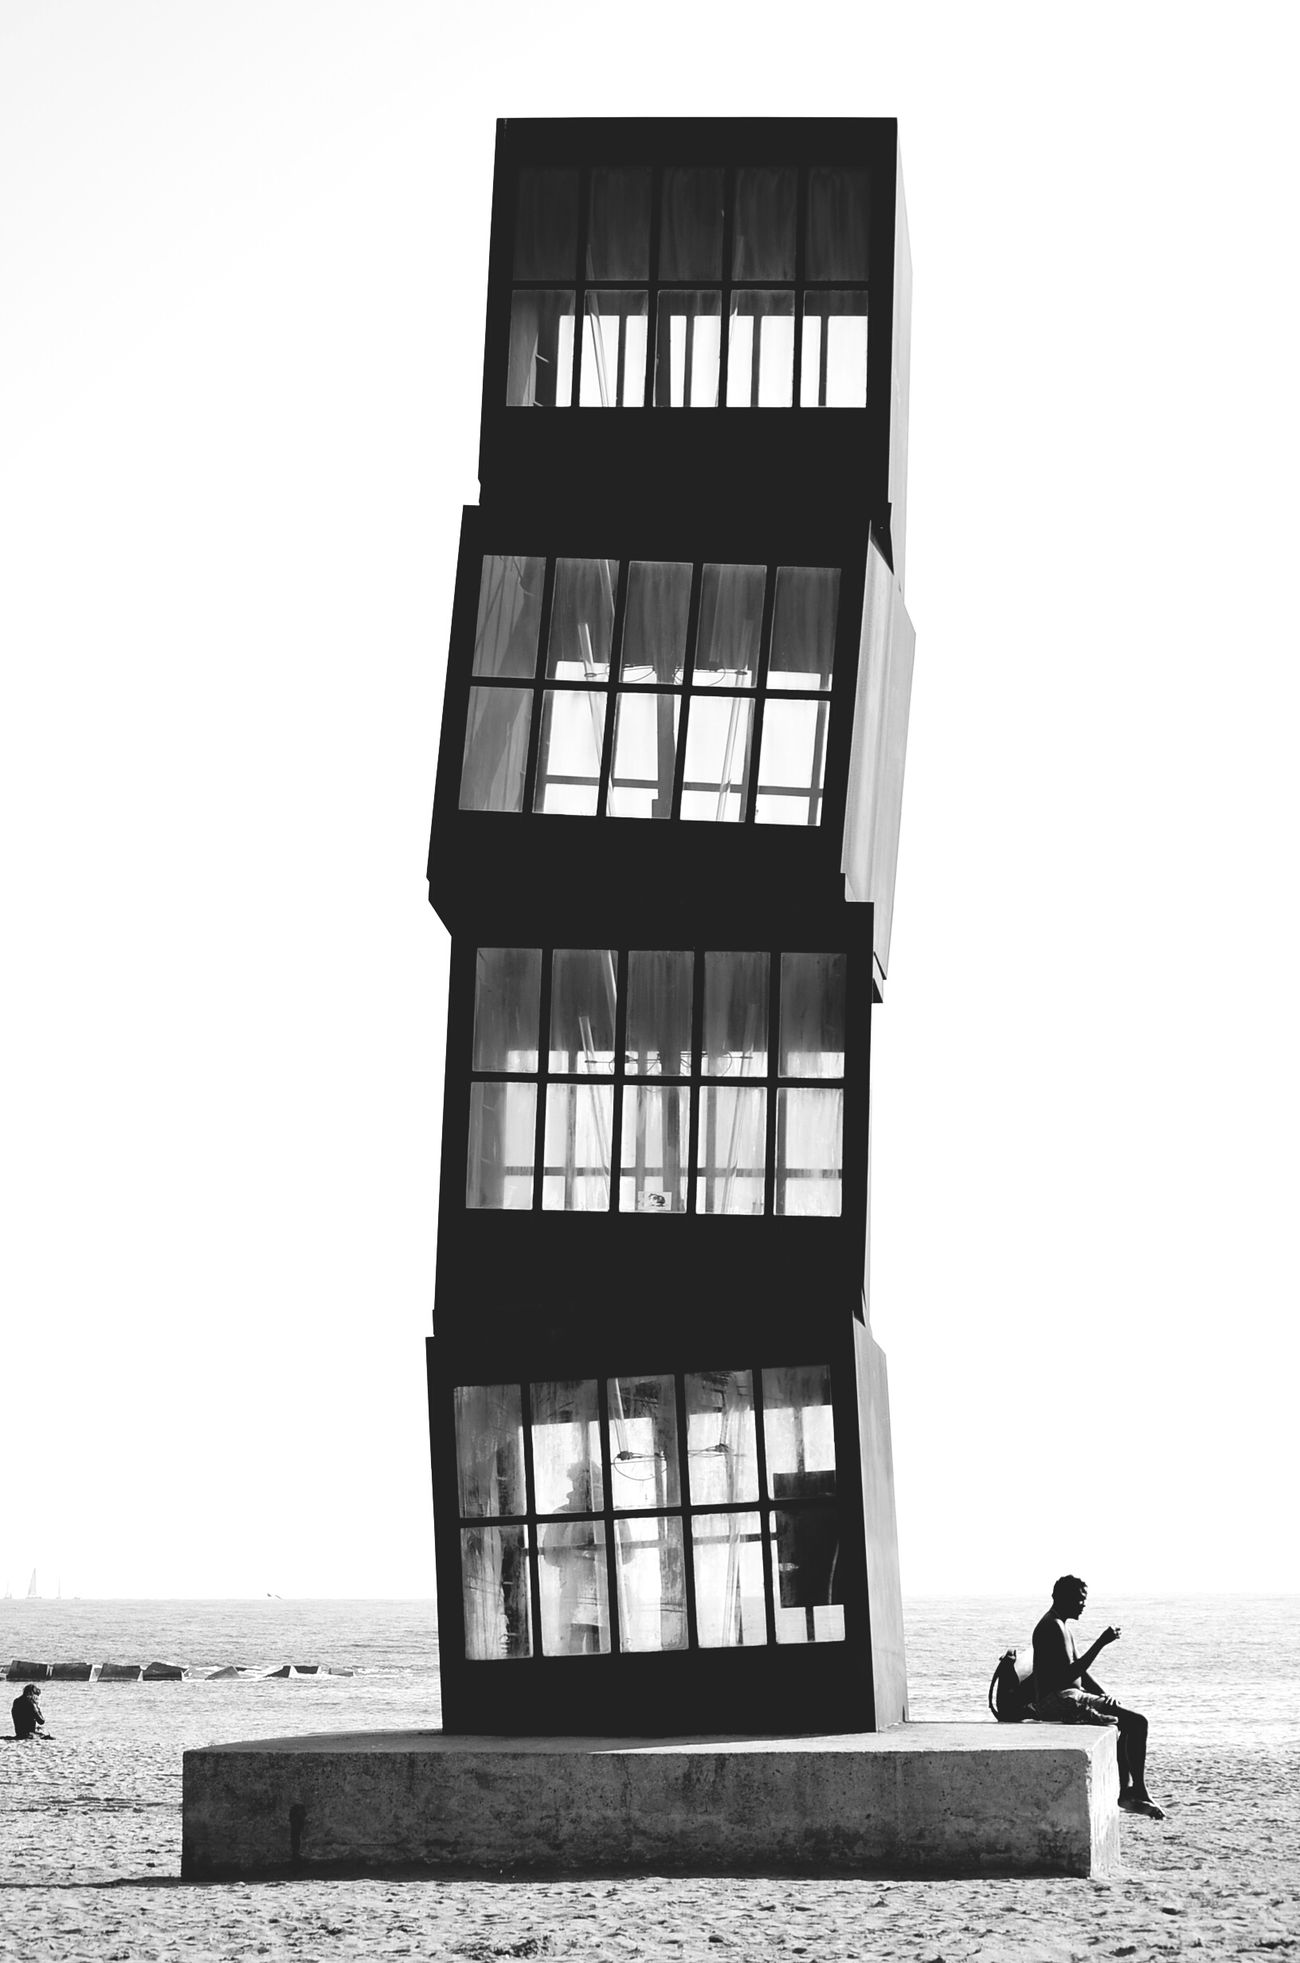 La vida entre cubos... Barcelona Streetphoto_bw Bnw Minimalobsession Minimalism Beachphotography Black & White Hello WorldTheMinimals (less Edit Juxt Photography) EyeEm Best Shots